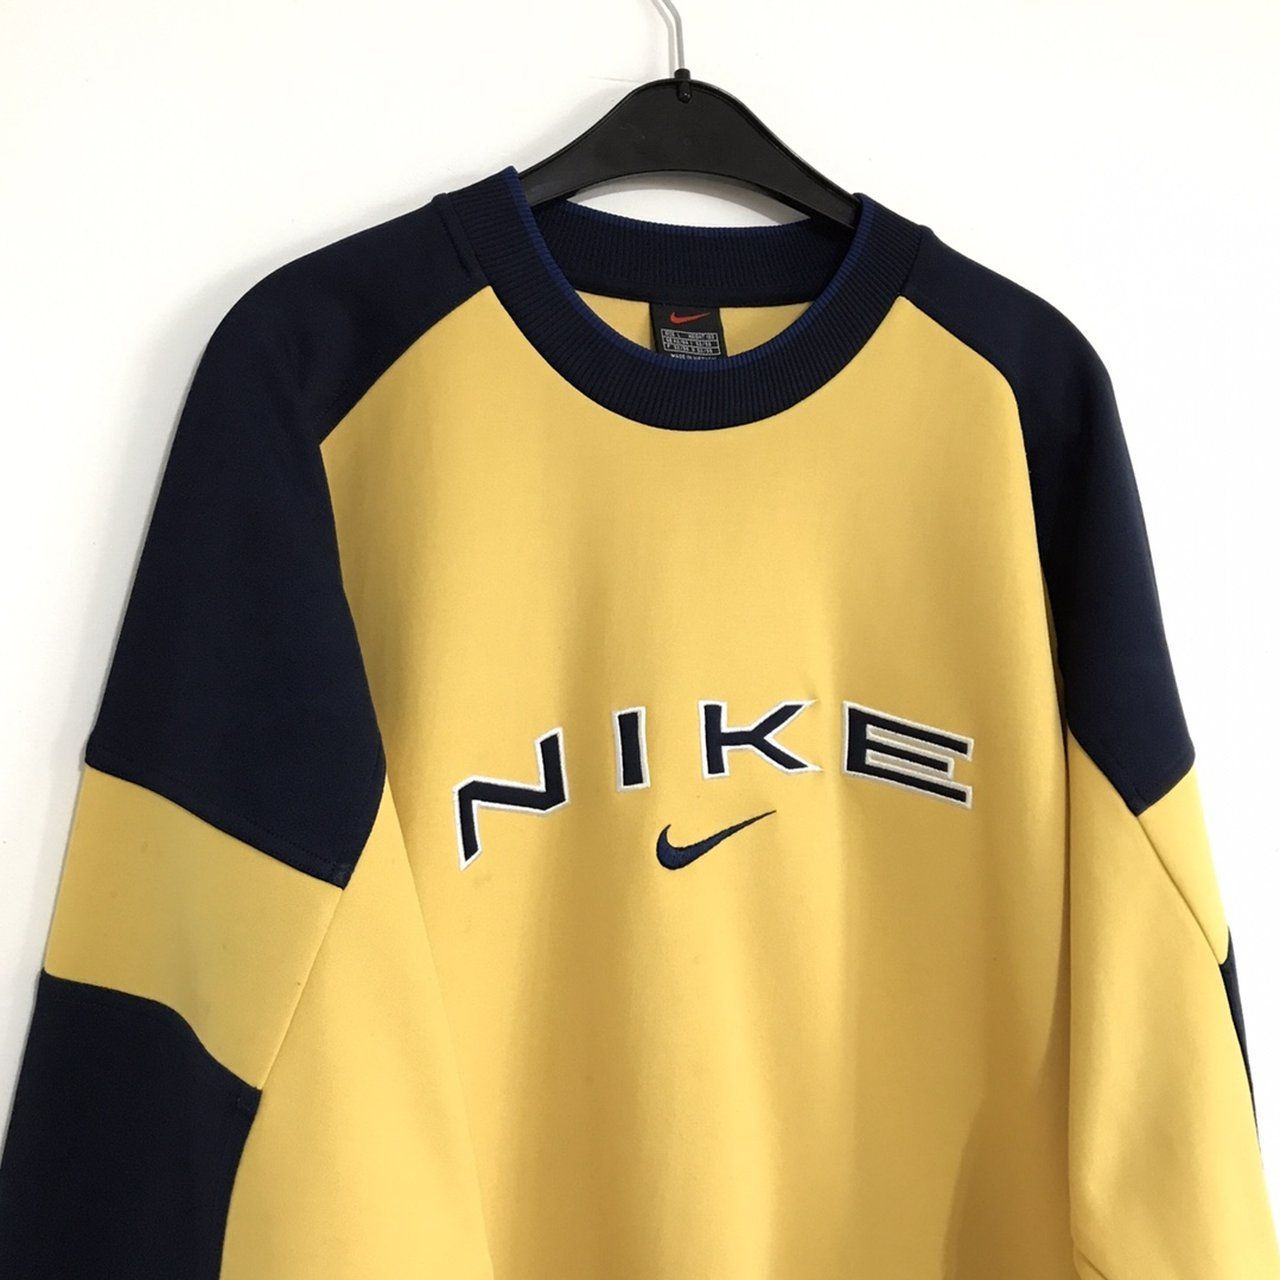 Vintage Nike Sweatshirt Size L Height 183 Gb Depop Vintage Nike Sweatshirt Trendy Hoodies Retro Outfits [ 1280 x 1280 Pixel ]